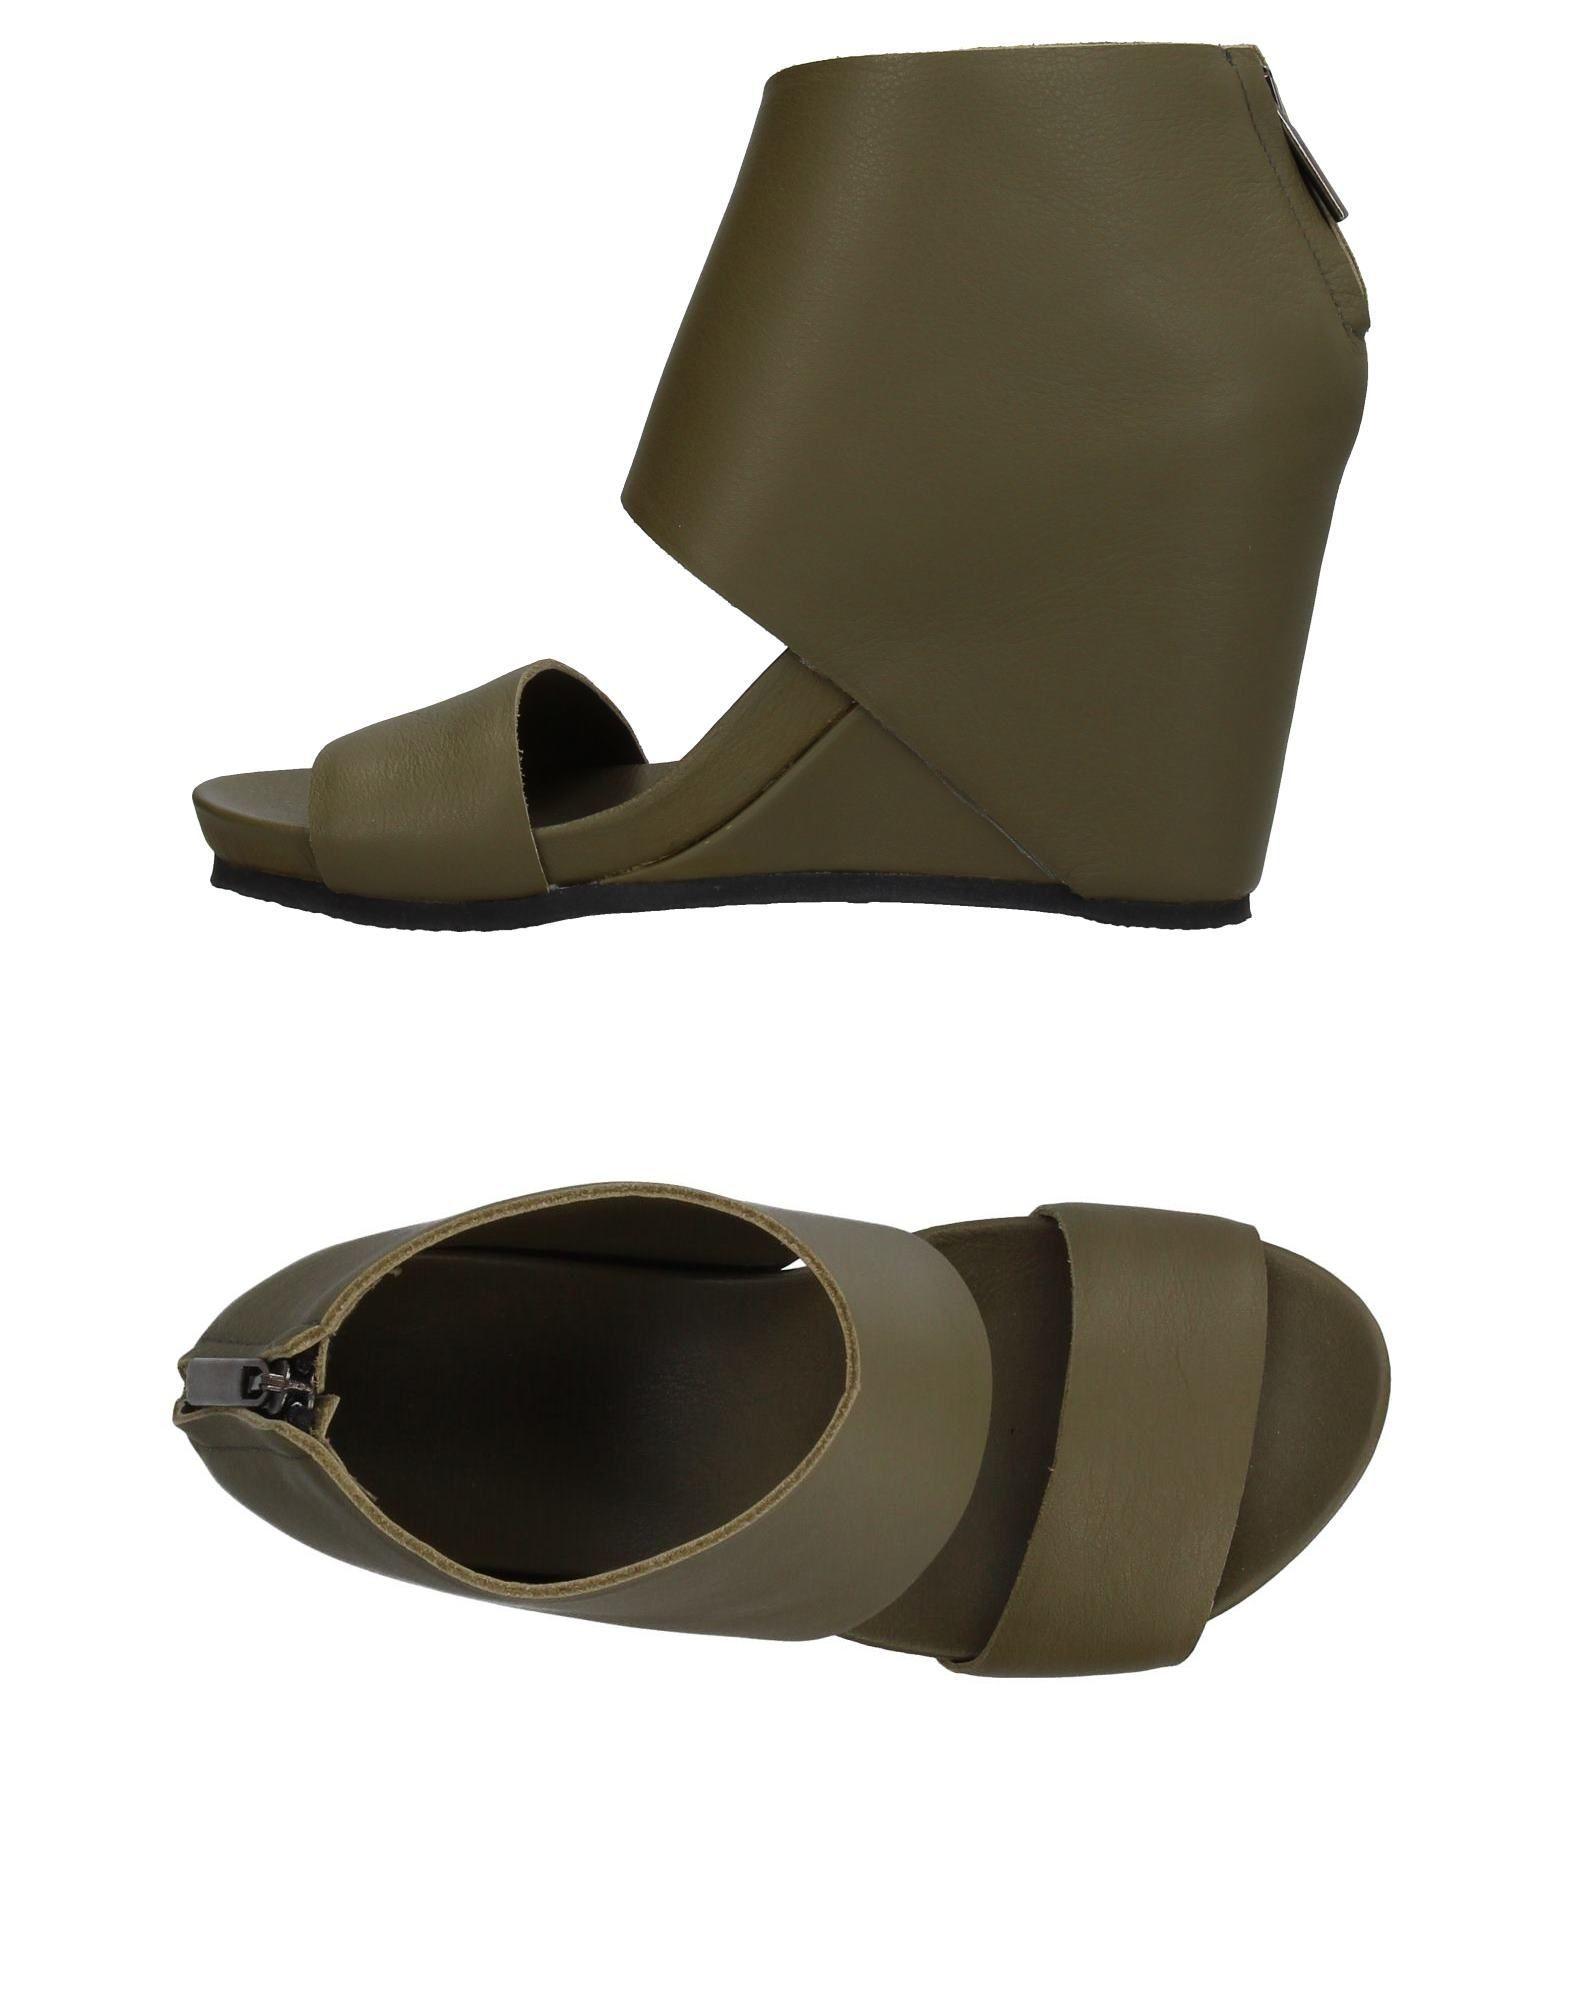 Peter Non Sandalen Damen  11391375UKGut aussehende strapazierfähige Schuhe